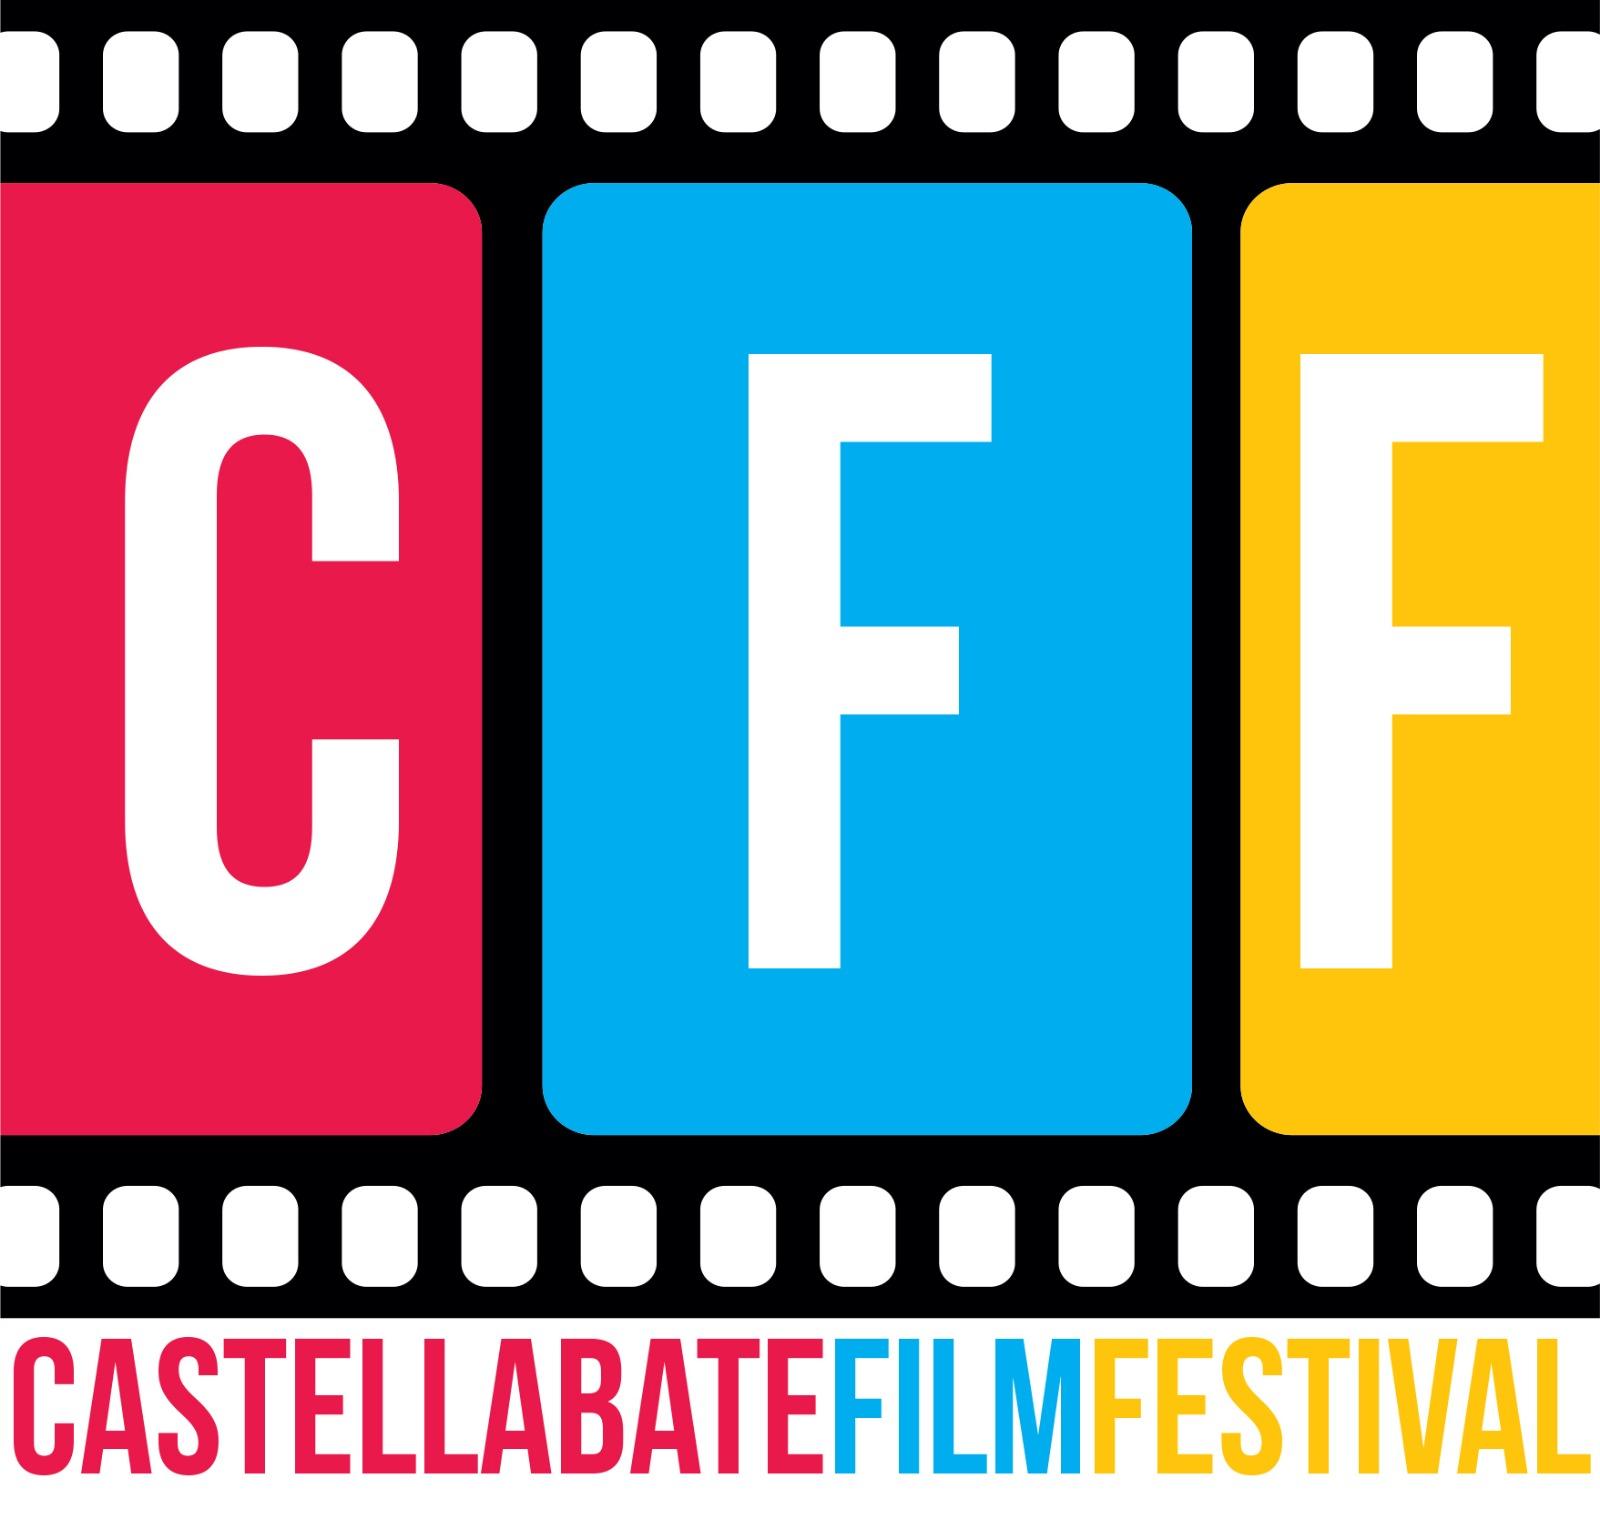 Castellabate Film Festival logo